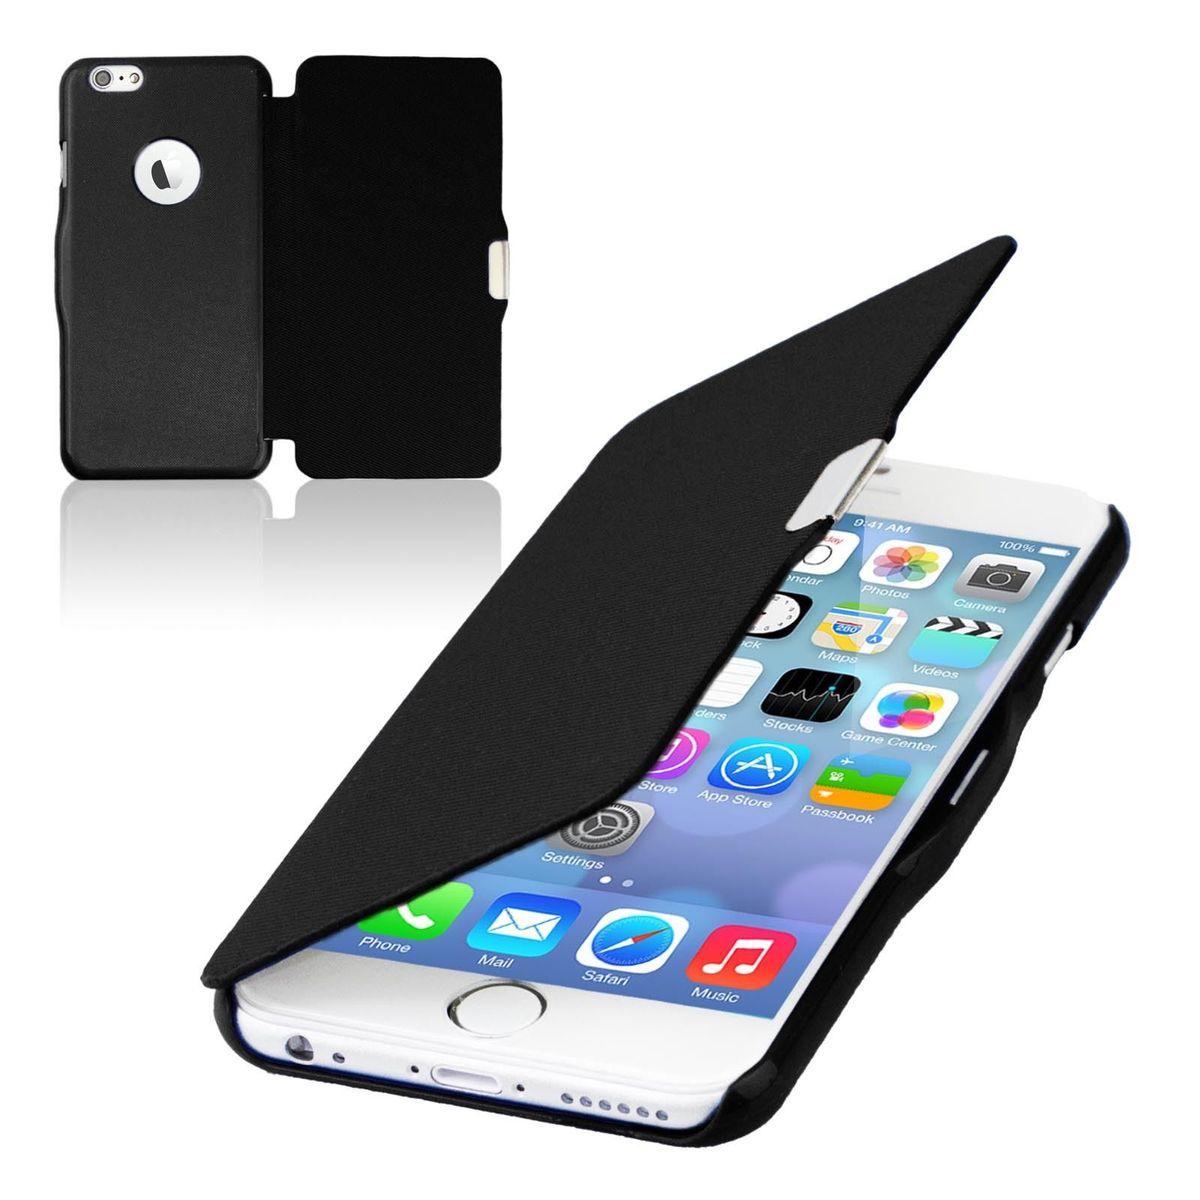 flip cover schutzh lle case handyh lle bookstyle f r apple iphone 6 6s plus schwarz. Black Bedroom Furniture Sets. Home Design Ideas